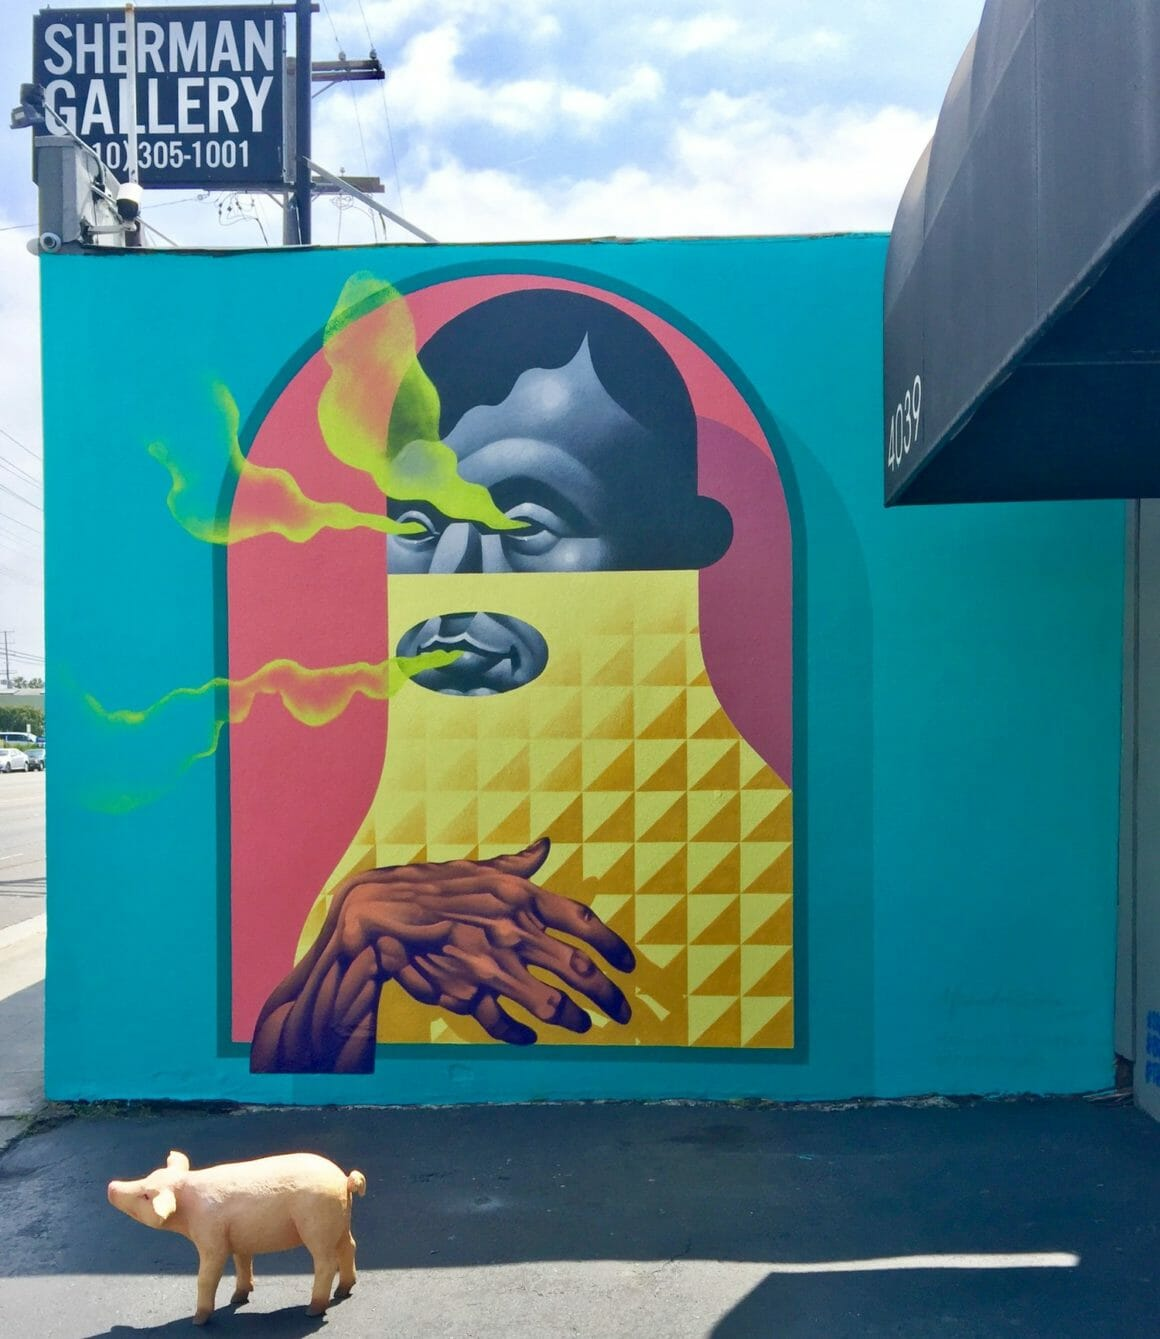 Sherman gallery